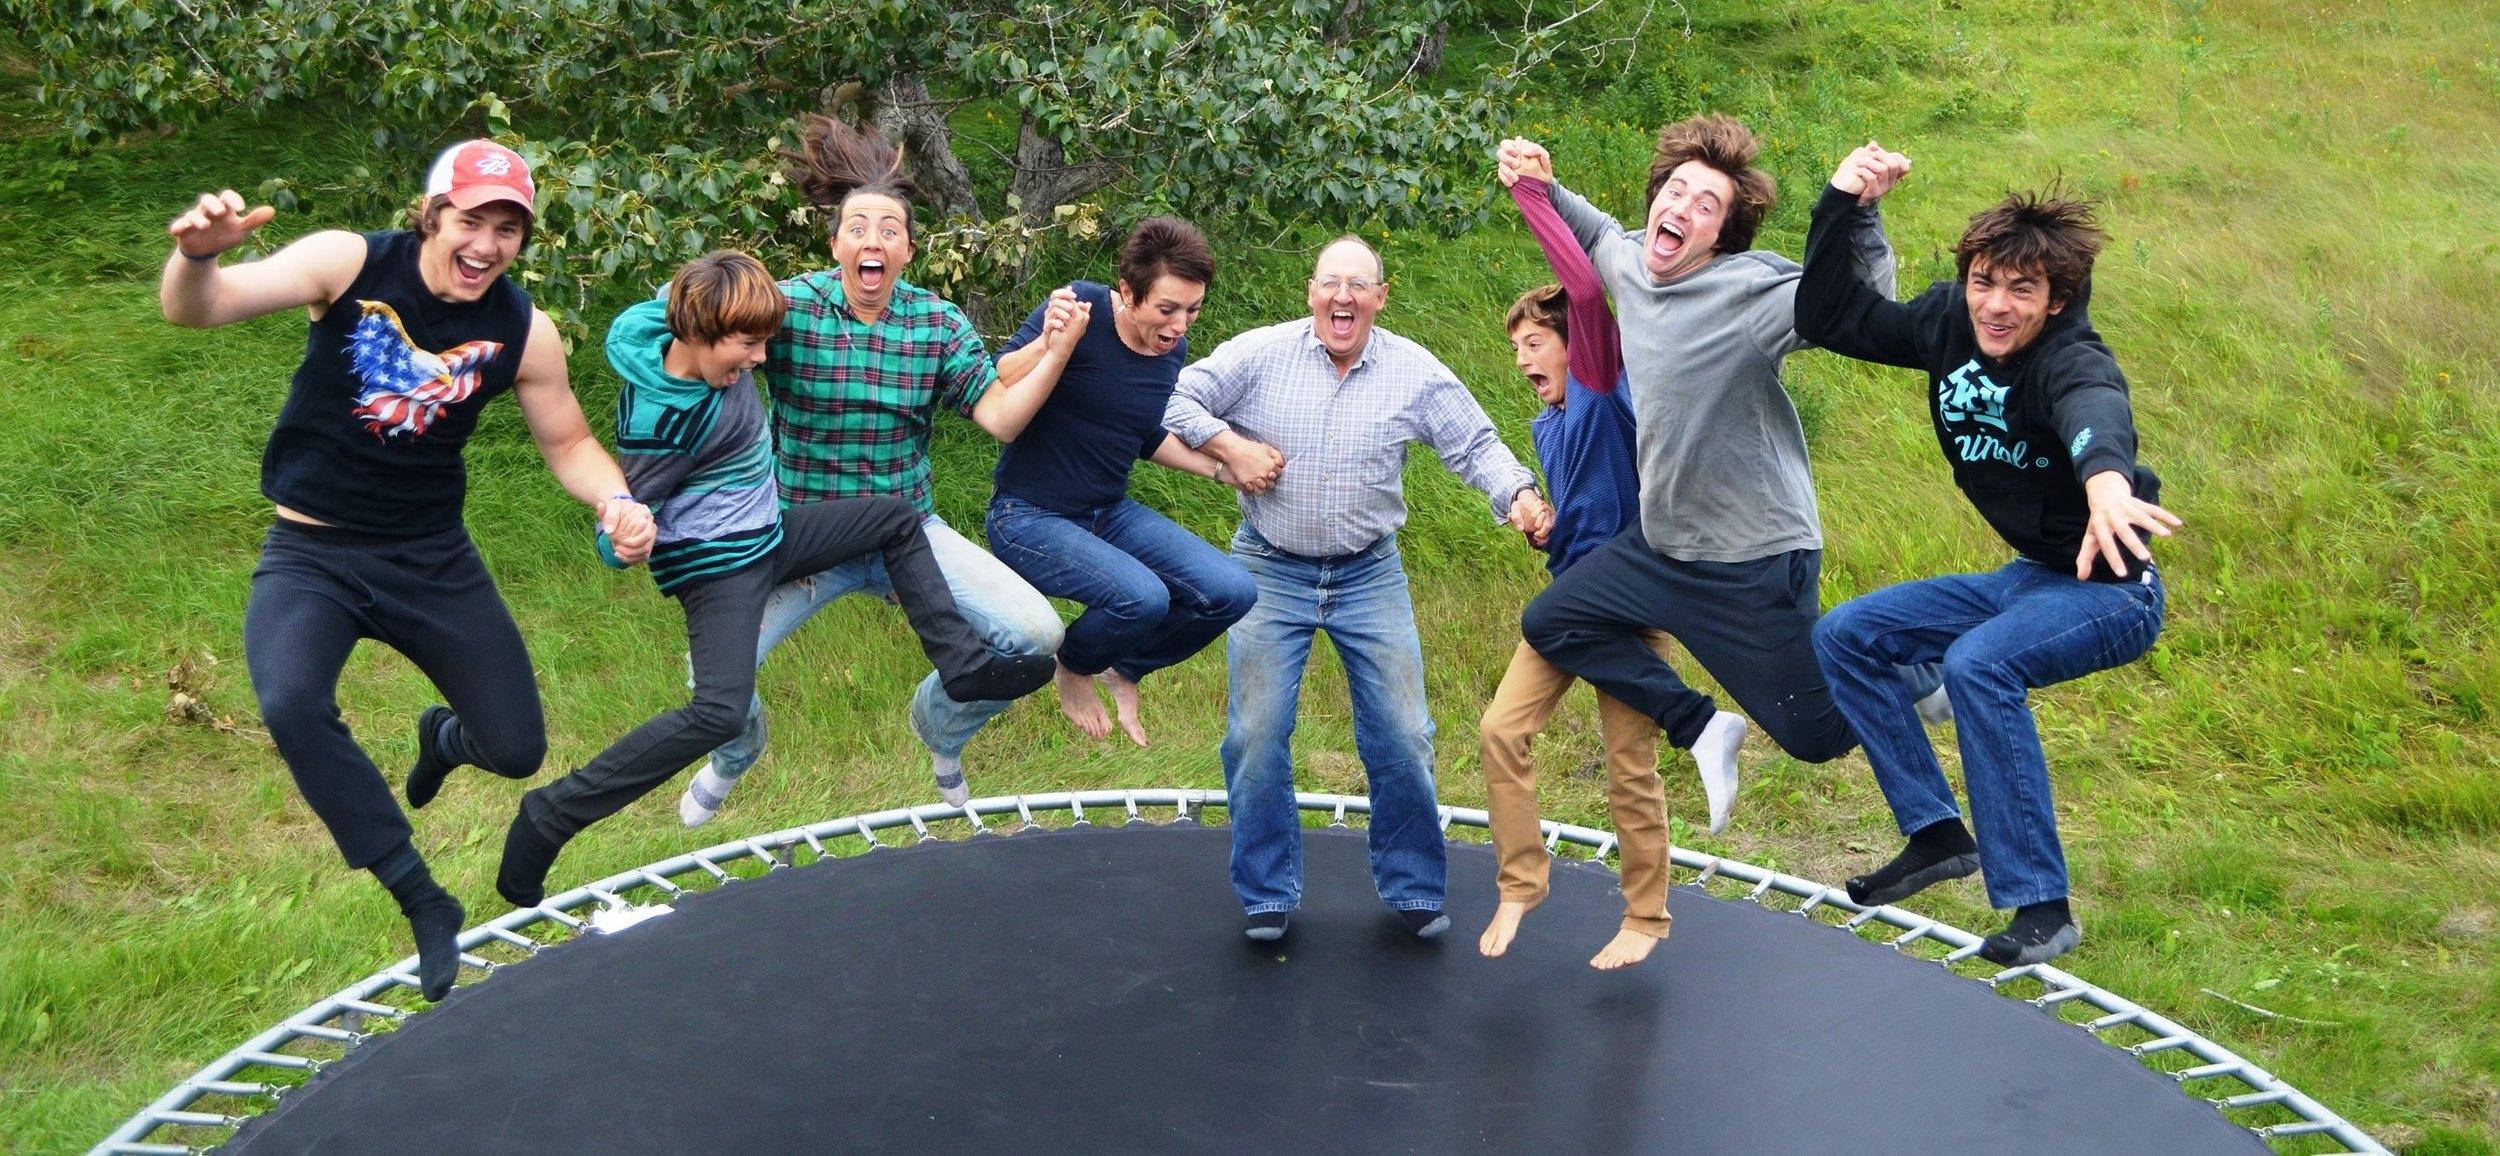 trampoline--family jumping.jpg